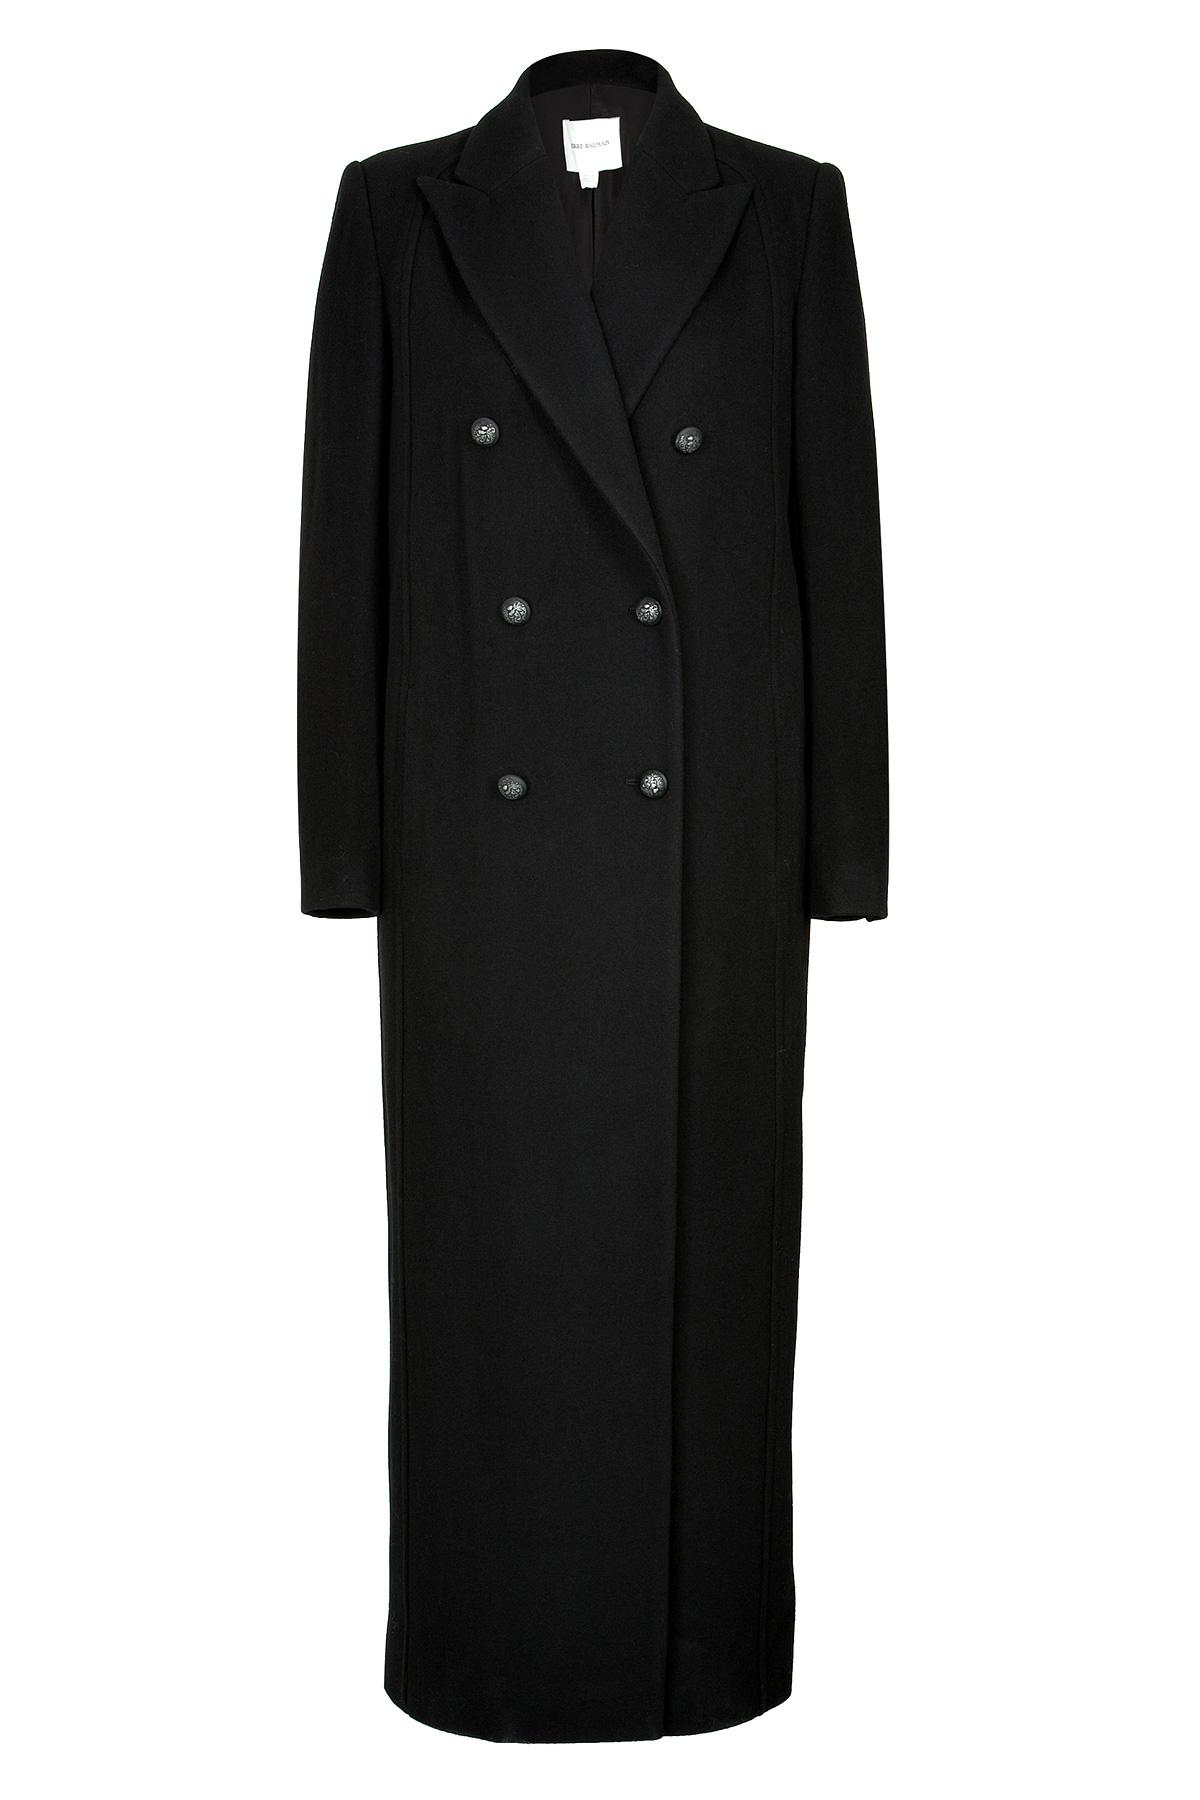 Balmain Wool Long Coat in Black | Lyst